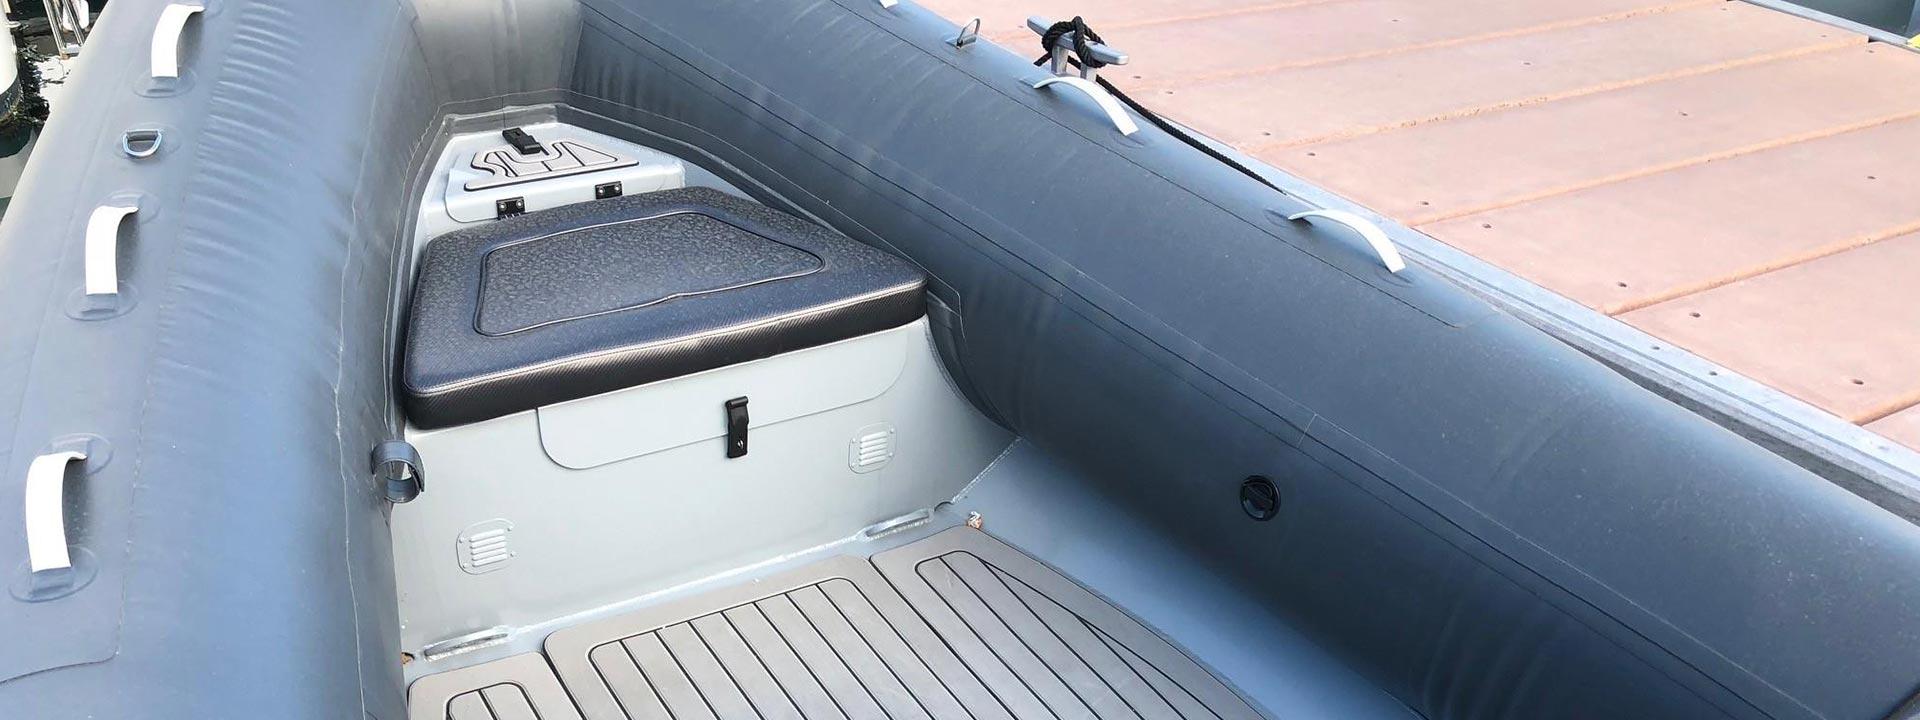 mayer-charter-boat-header-highfield-640-dl-02